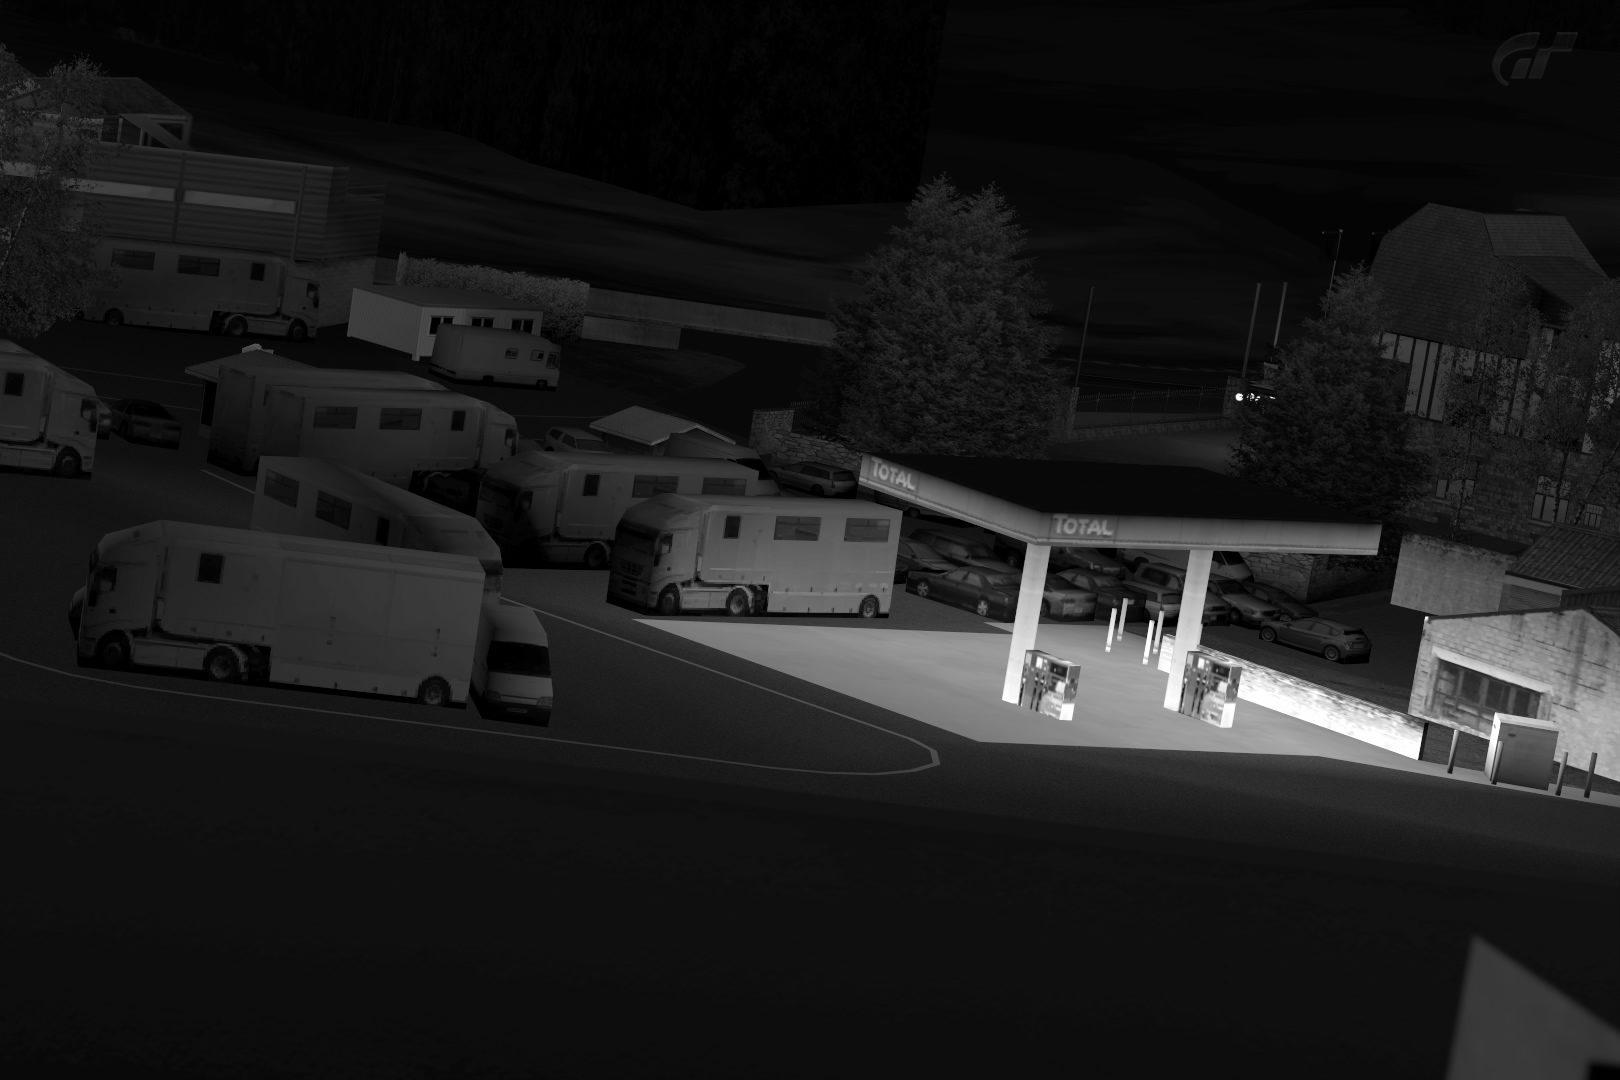 Circuit de Spa-Francorchamps_34.jpg